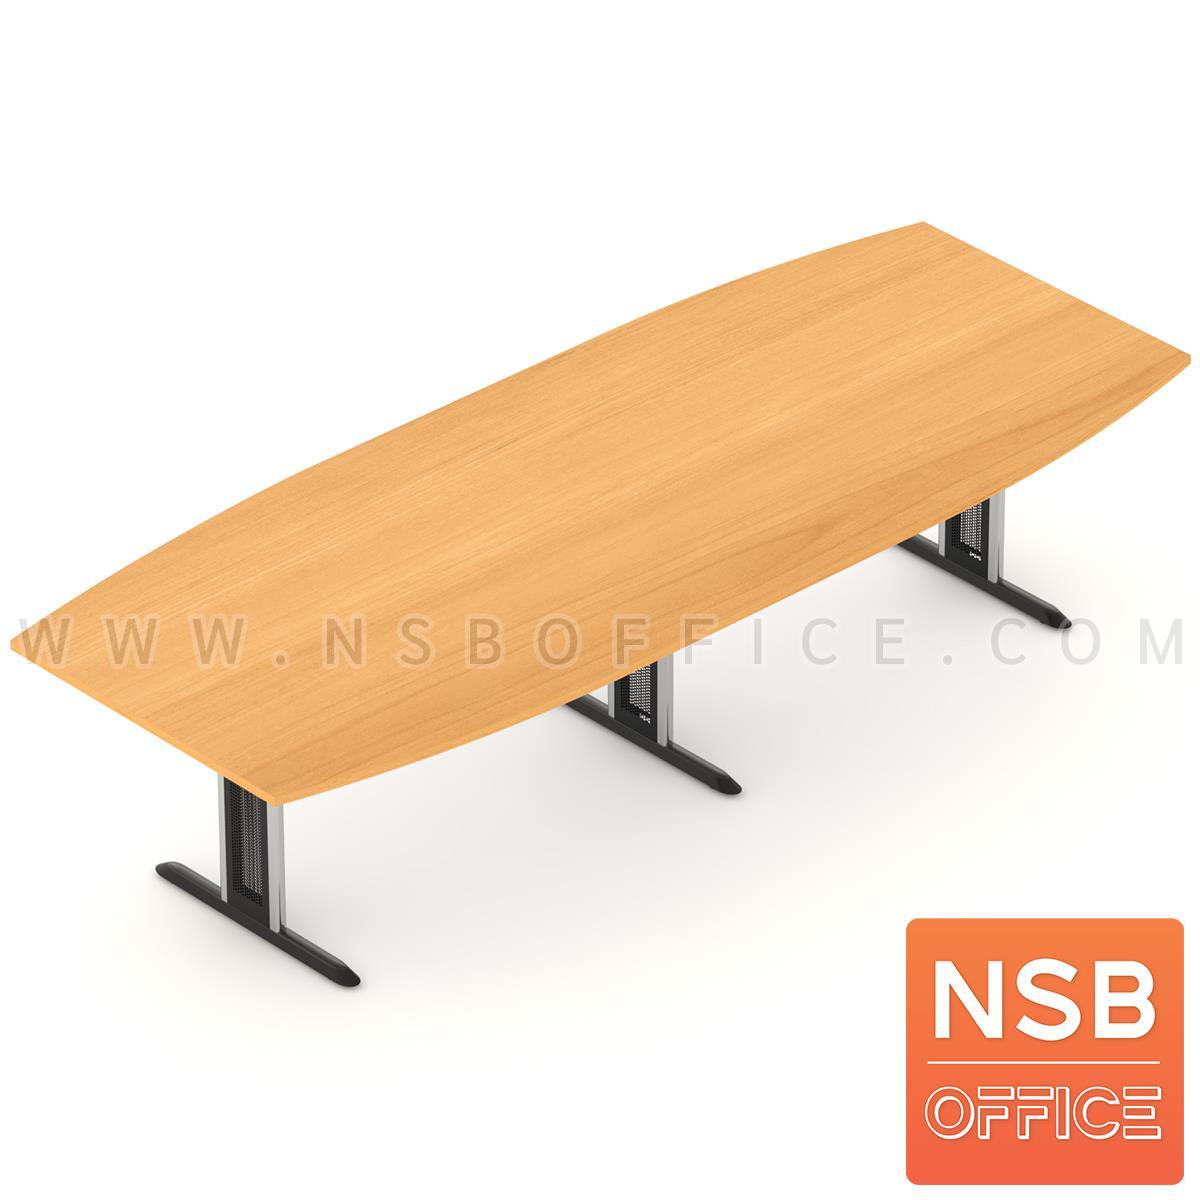 A05A124:โต๊ะประชุมทรงเรือ  ขนาด 300W ,360W ,400W ,480W cm. พร้อมระบบคานเหล็ก ขาเหล็กตัวไอ